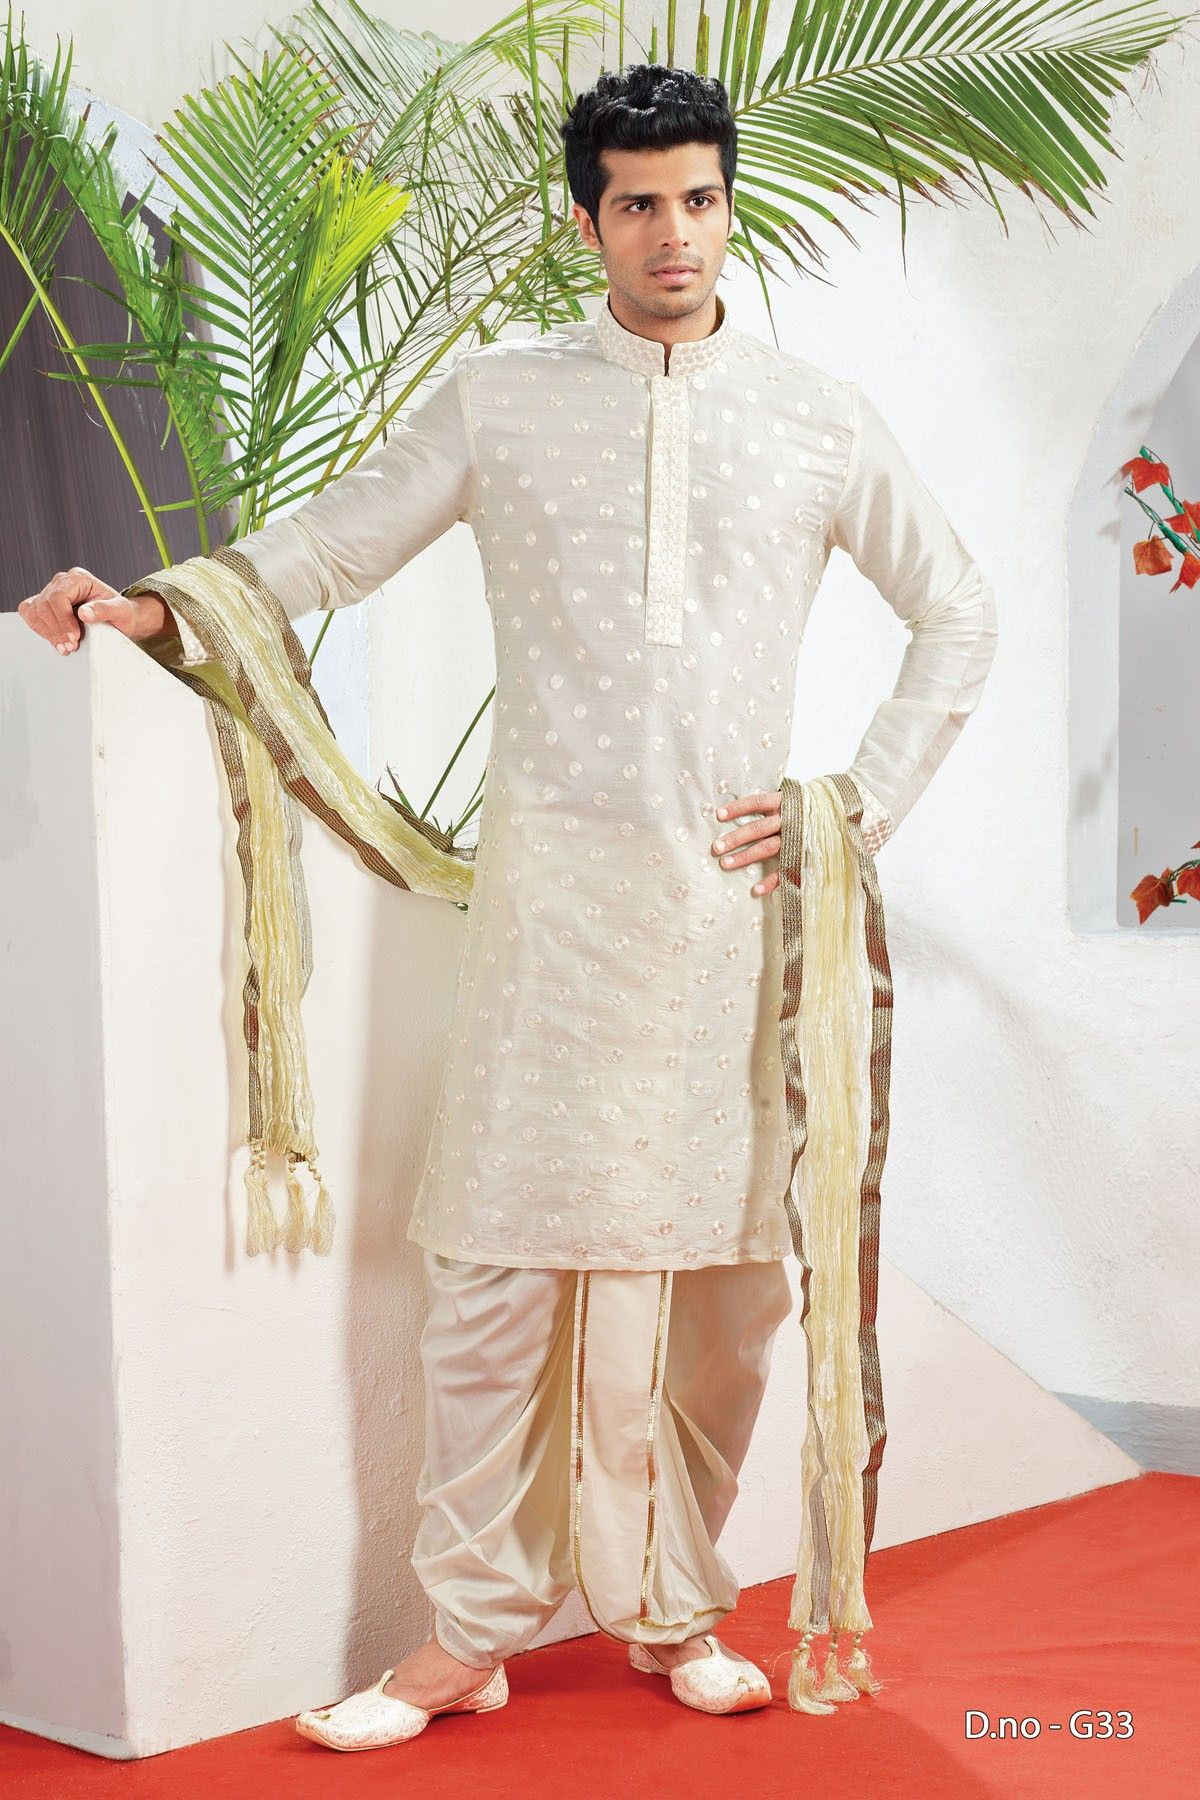 Pin By Ravi On Raksha Gohil In 2019 Groom Wedding Dress